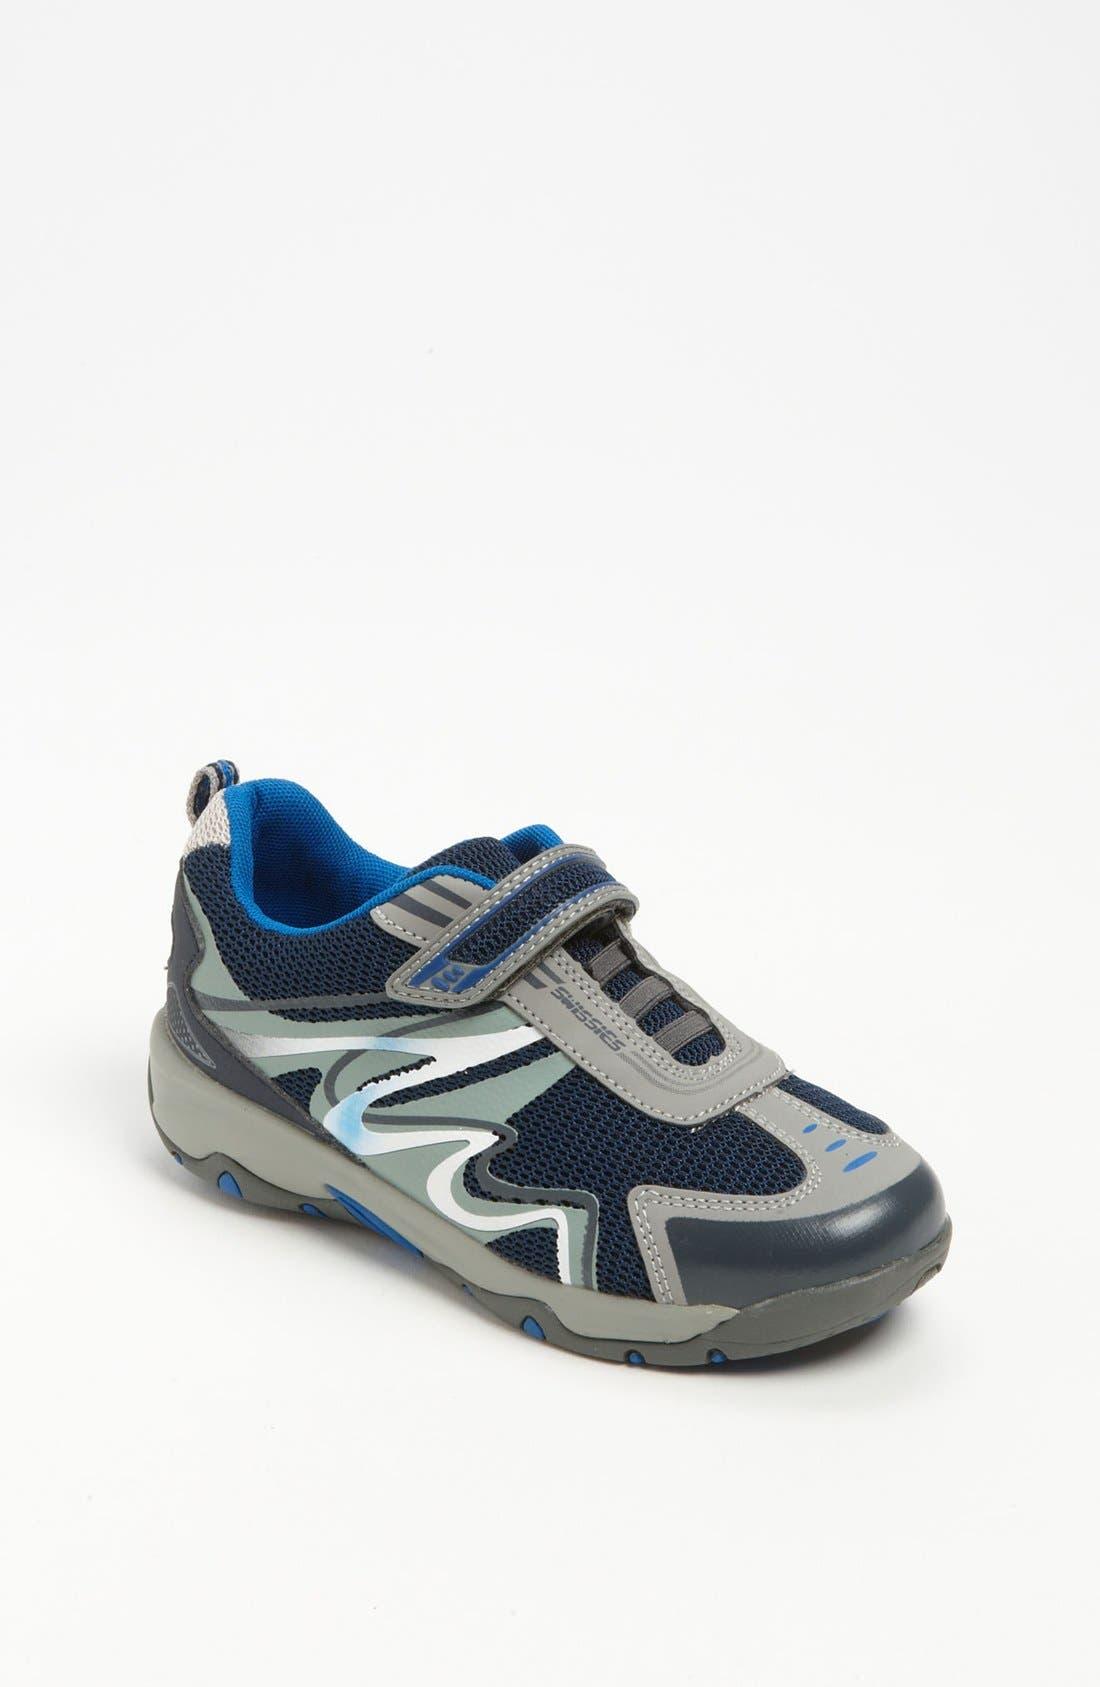 Alternate Image 1 Selected - Swissies 'Speed' Sneaker (Toddler & Little Kid)